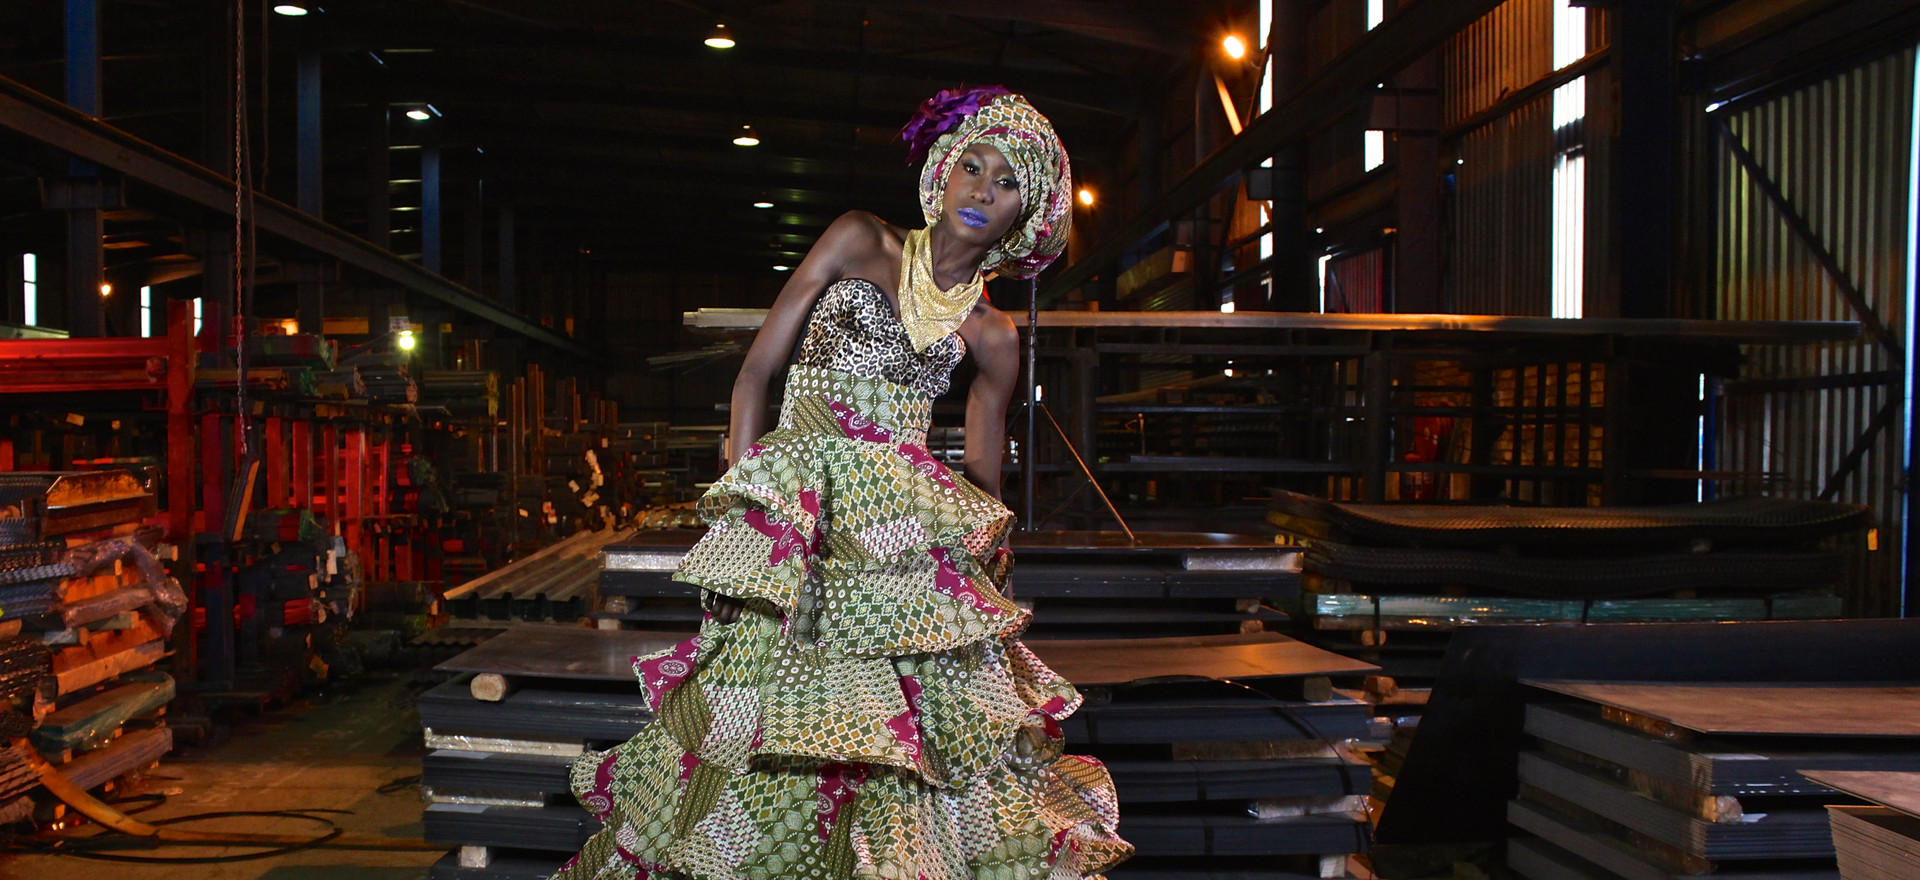 Liz Ogumbo Whatchyu Know about Her 10